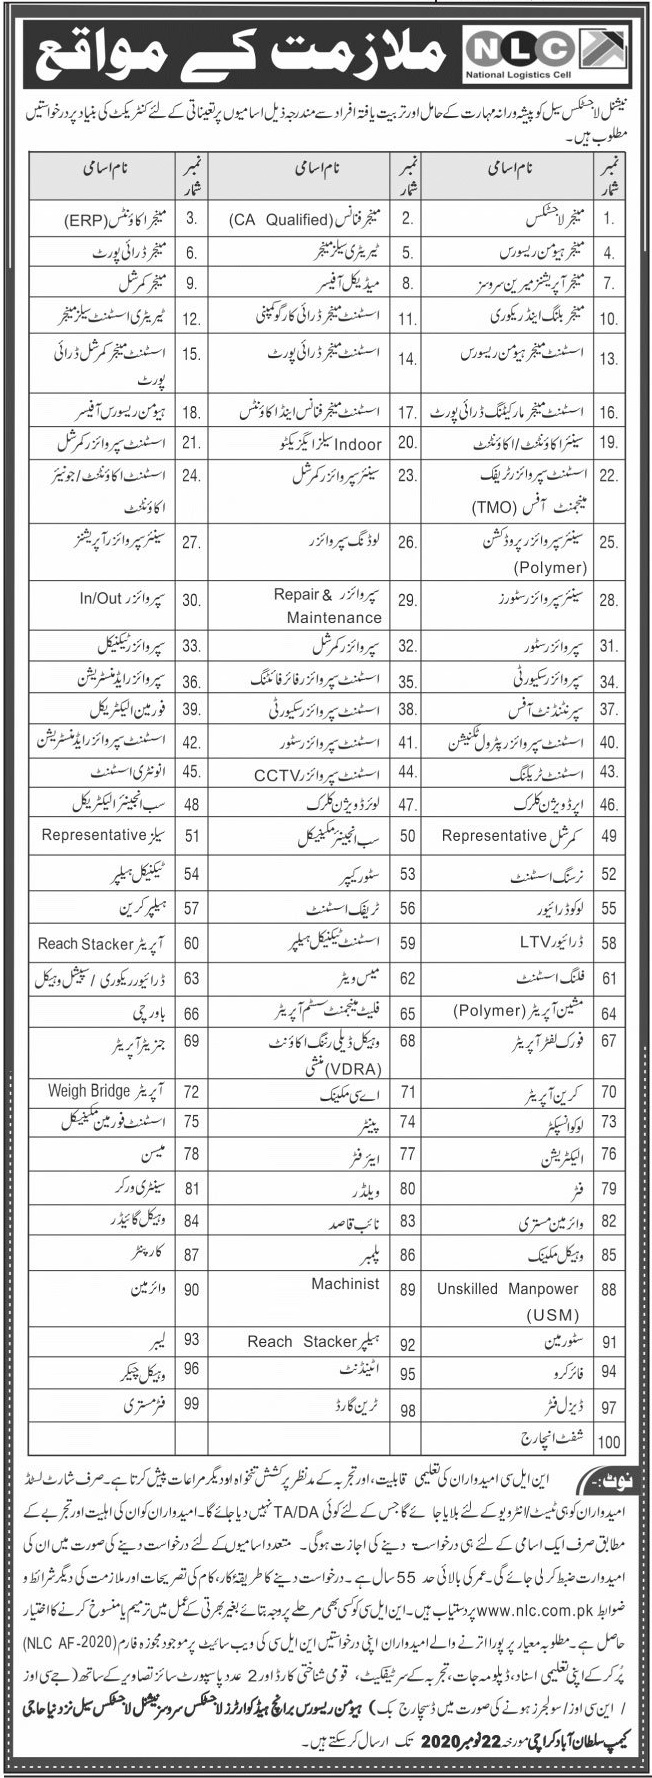 National Logistics Cell NLC Jobs 2020 in Karachi